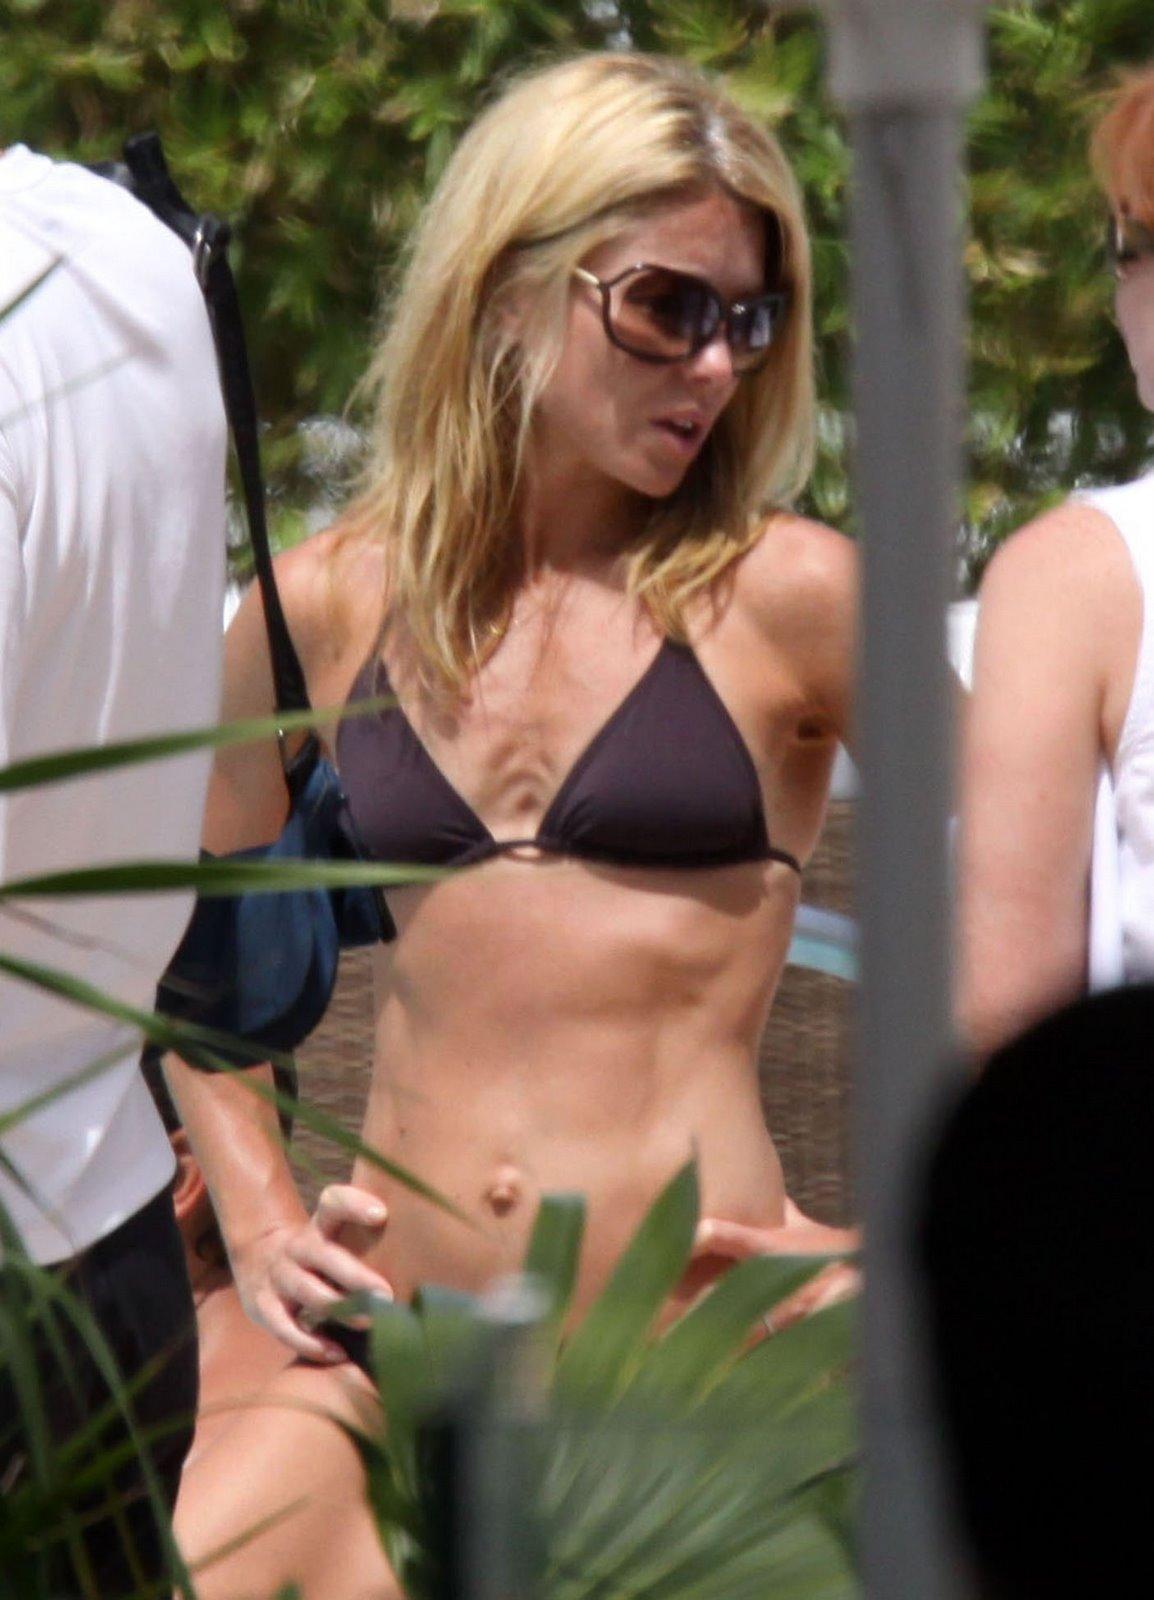 http://4.bp.blogspot.com/_gz86NfbA0Go/SgGSeD6oAUI/AAAAAAAACl8/bBTt-yJ-_VM/s1600/Kelly_Ripa_Micro_Bikini_Pictures_2.jpg